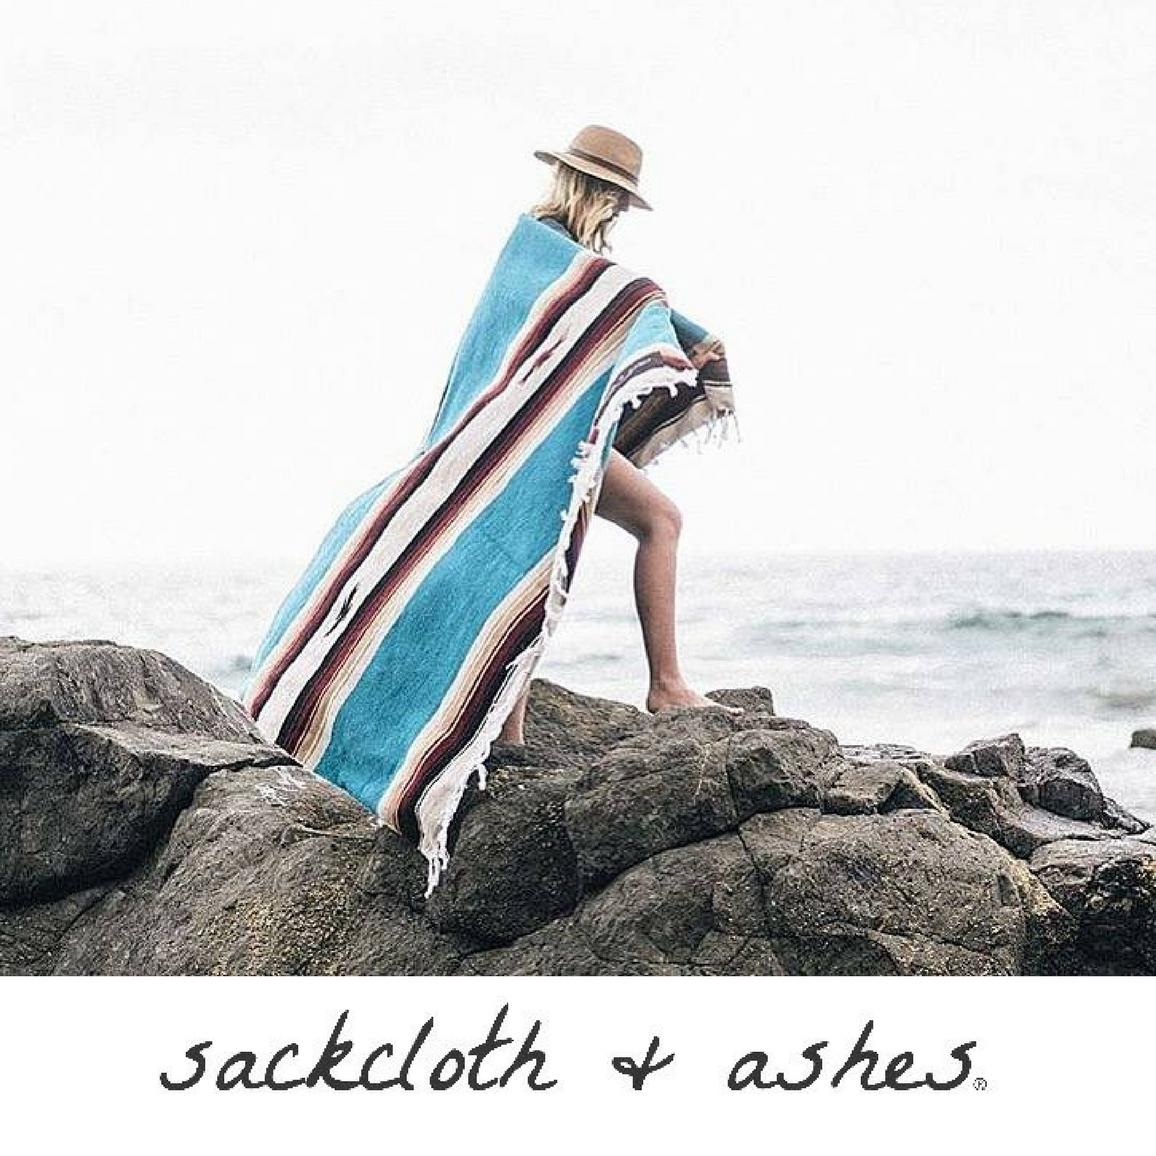 Sackcloth & Ashes Brand Image.jpg